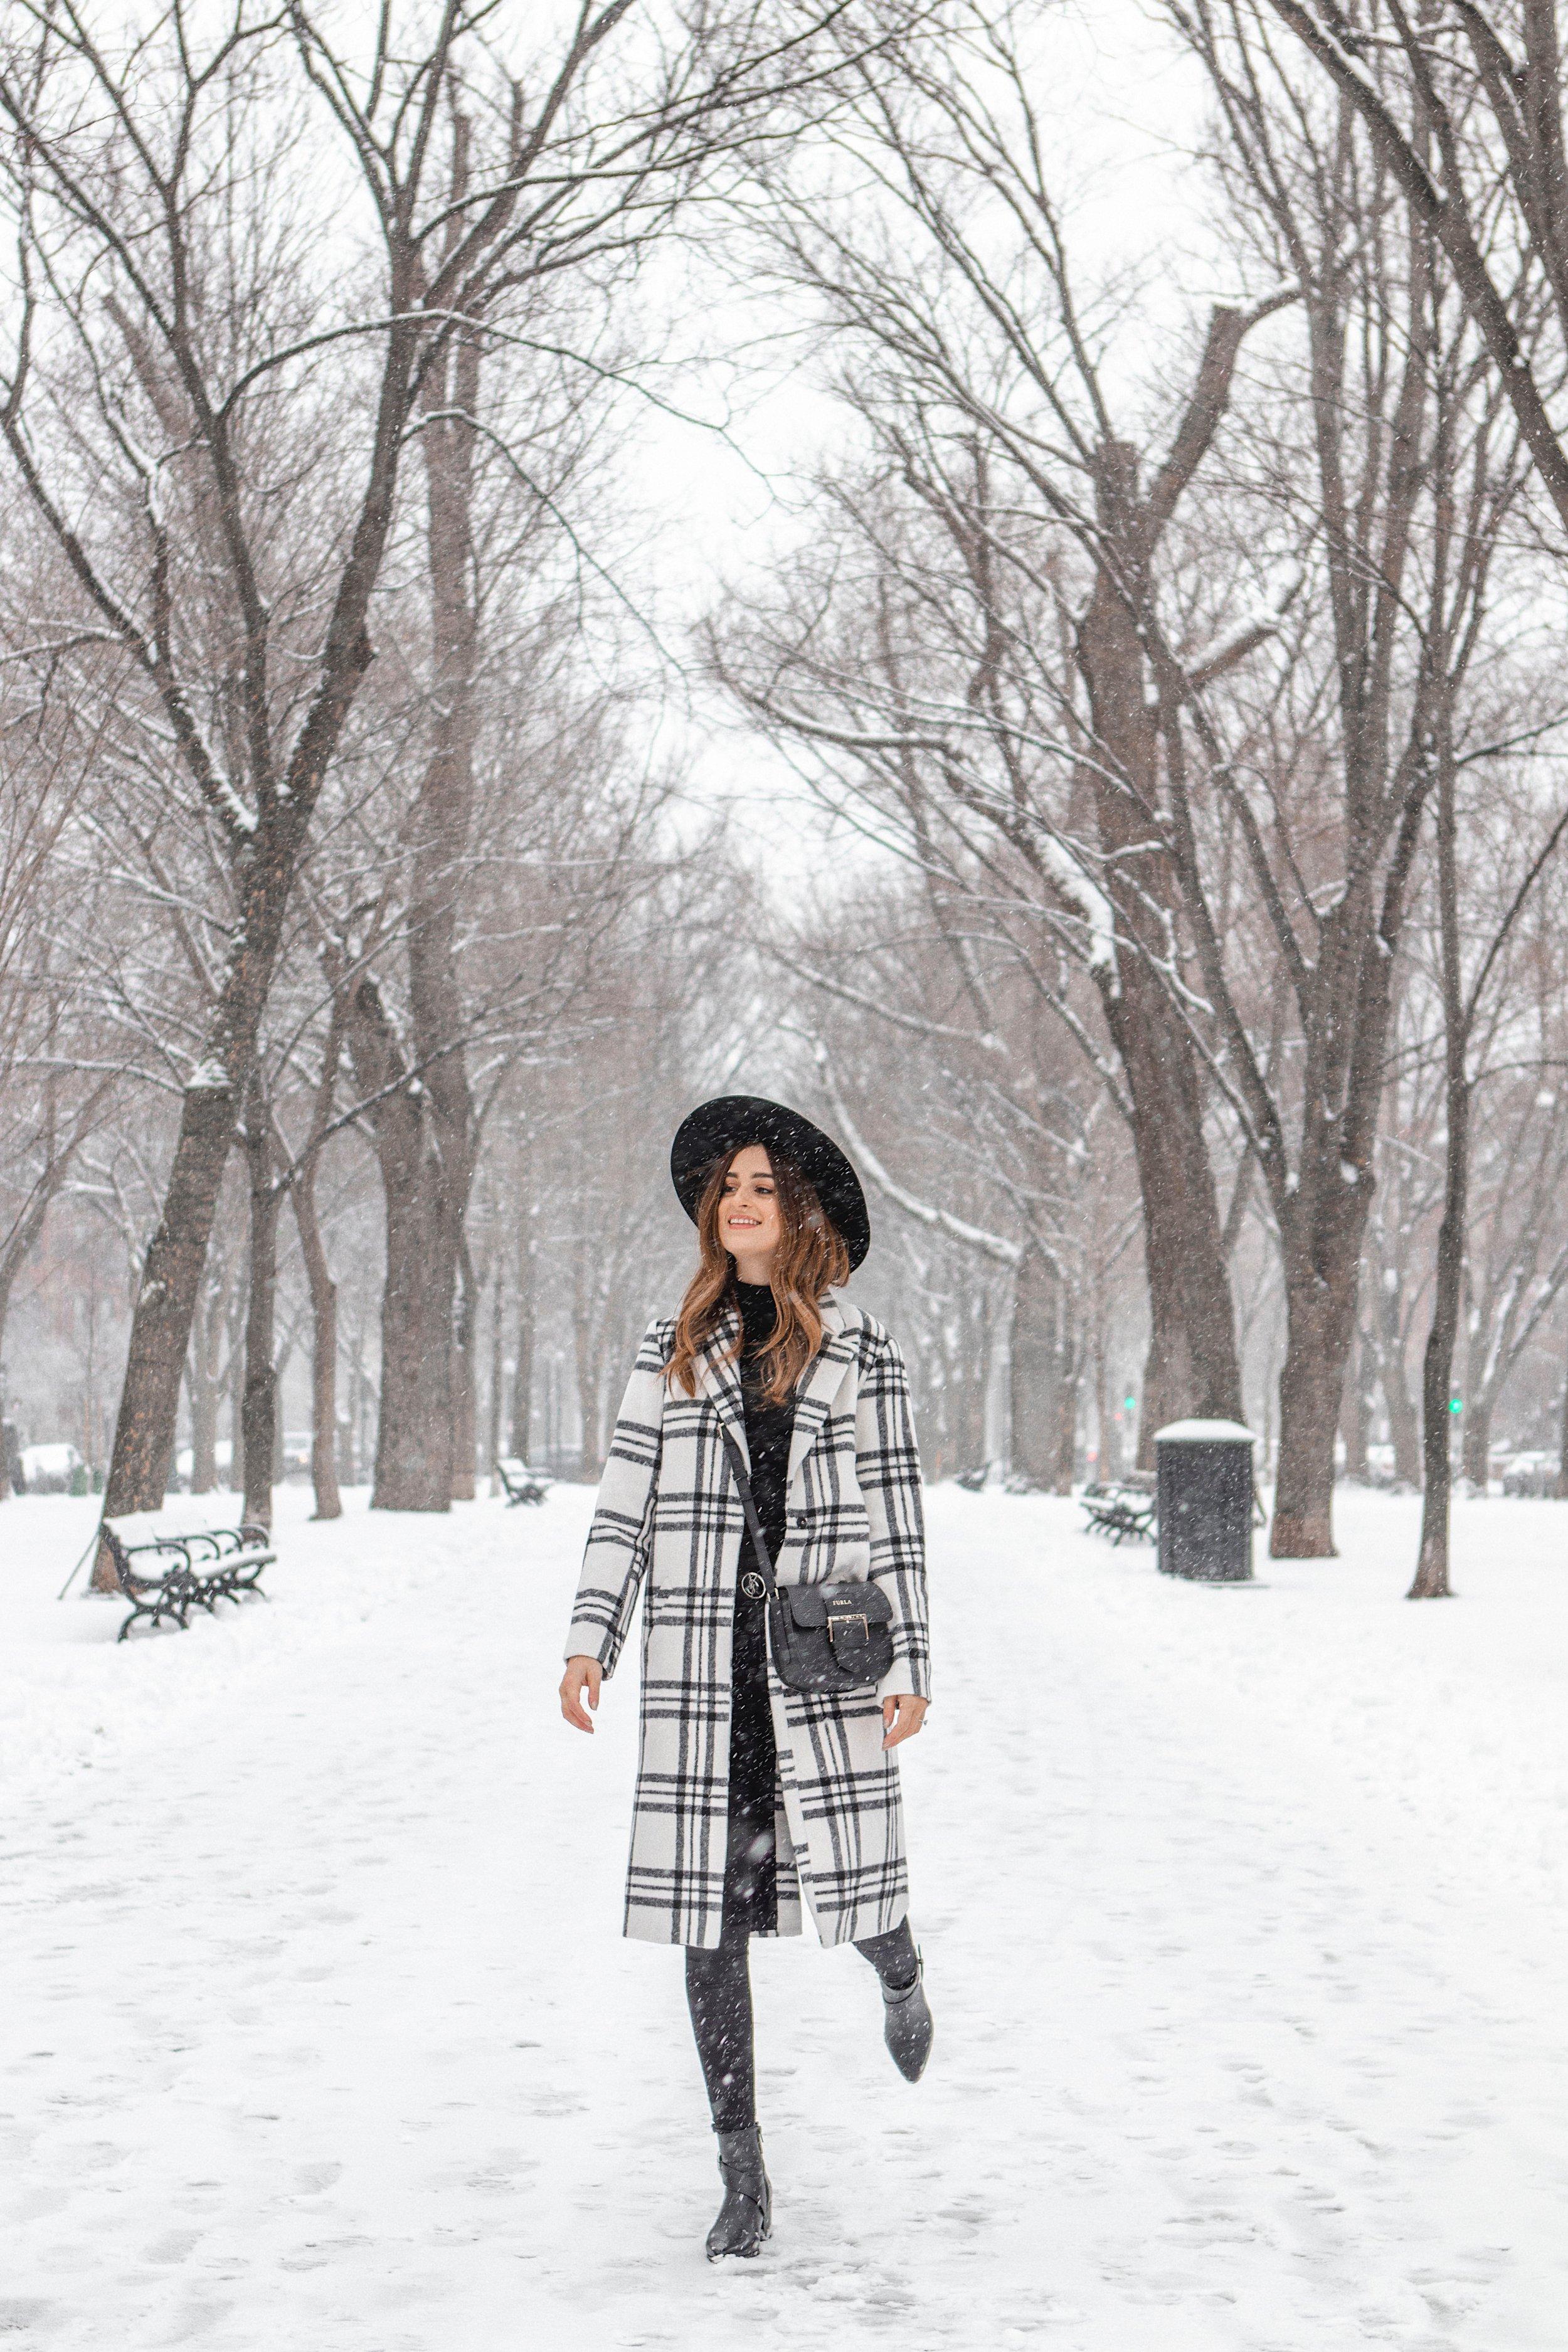 WinterBoston